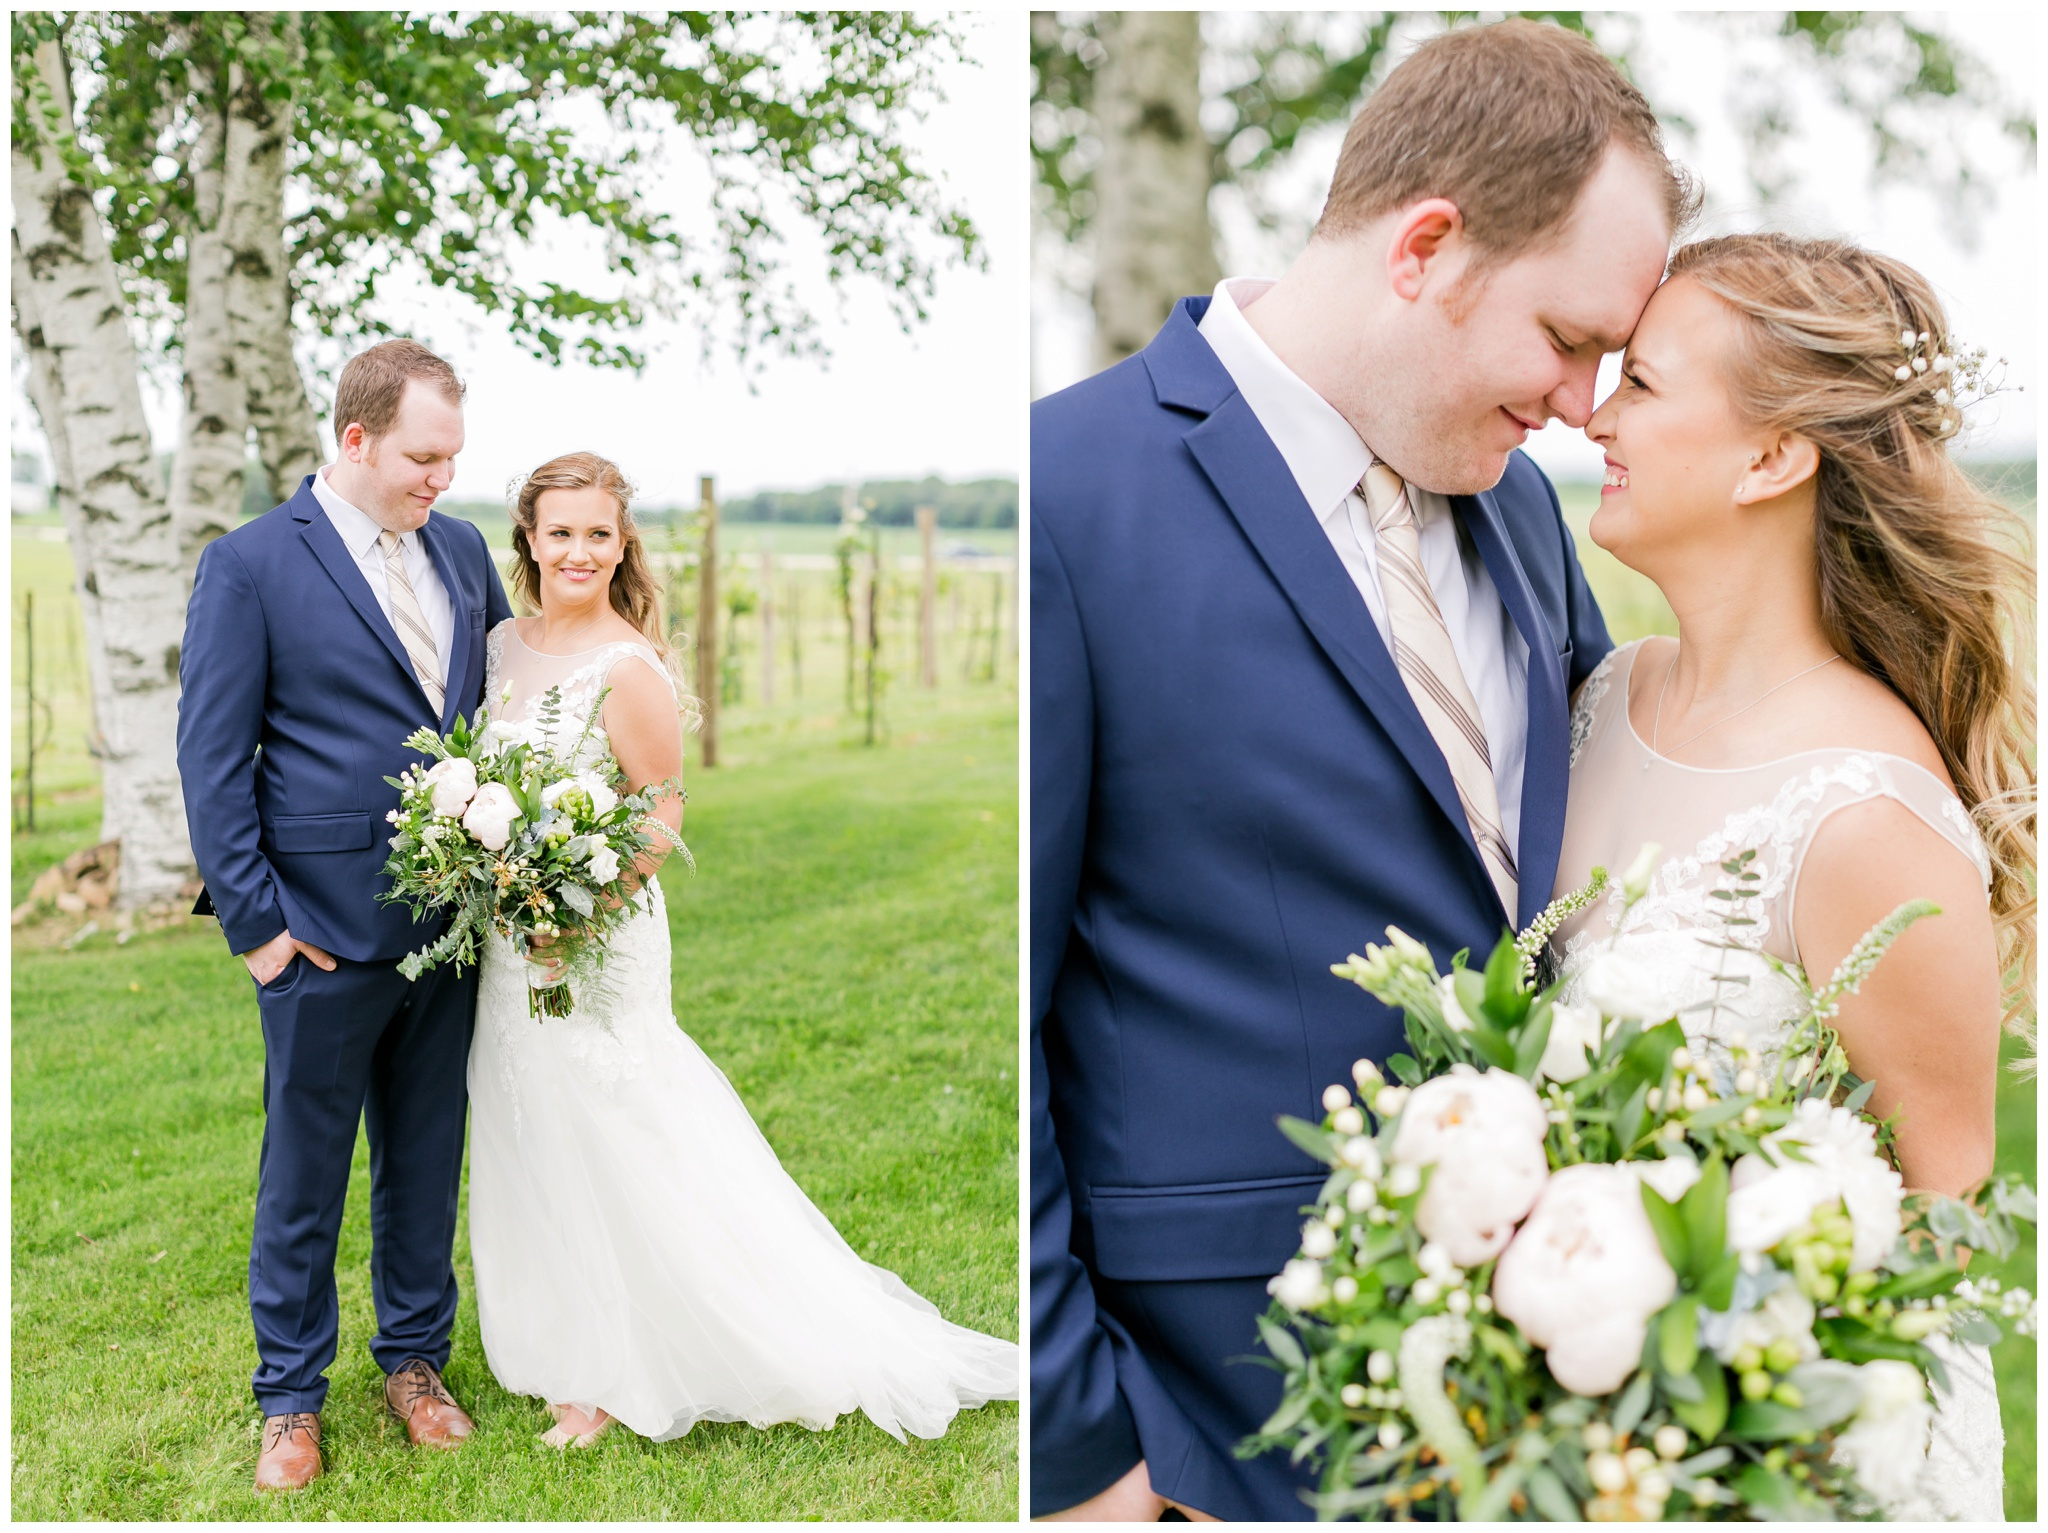 over_the_vines_wedding_edgerton_wisconsin_wedding_caynay_photo_3984.jpg